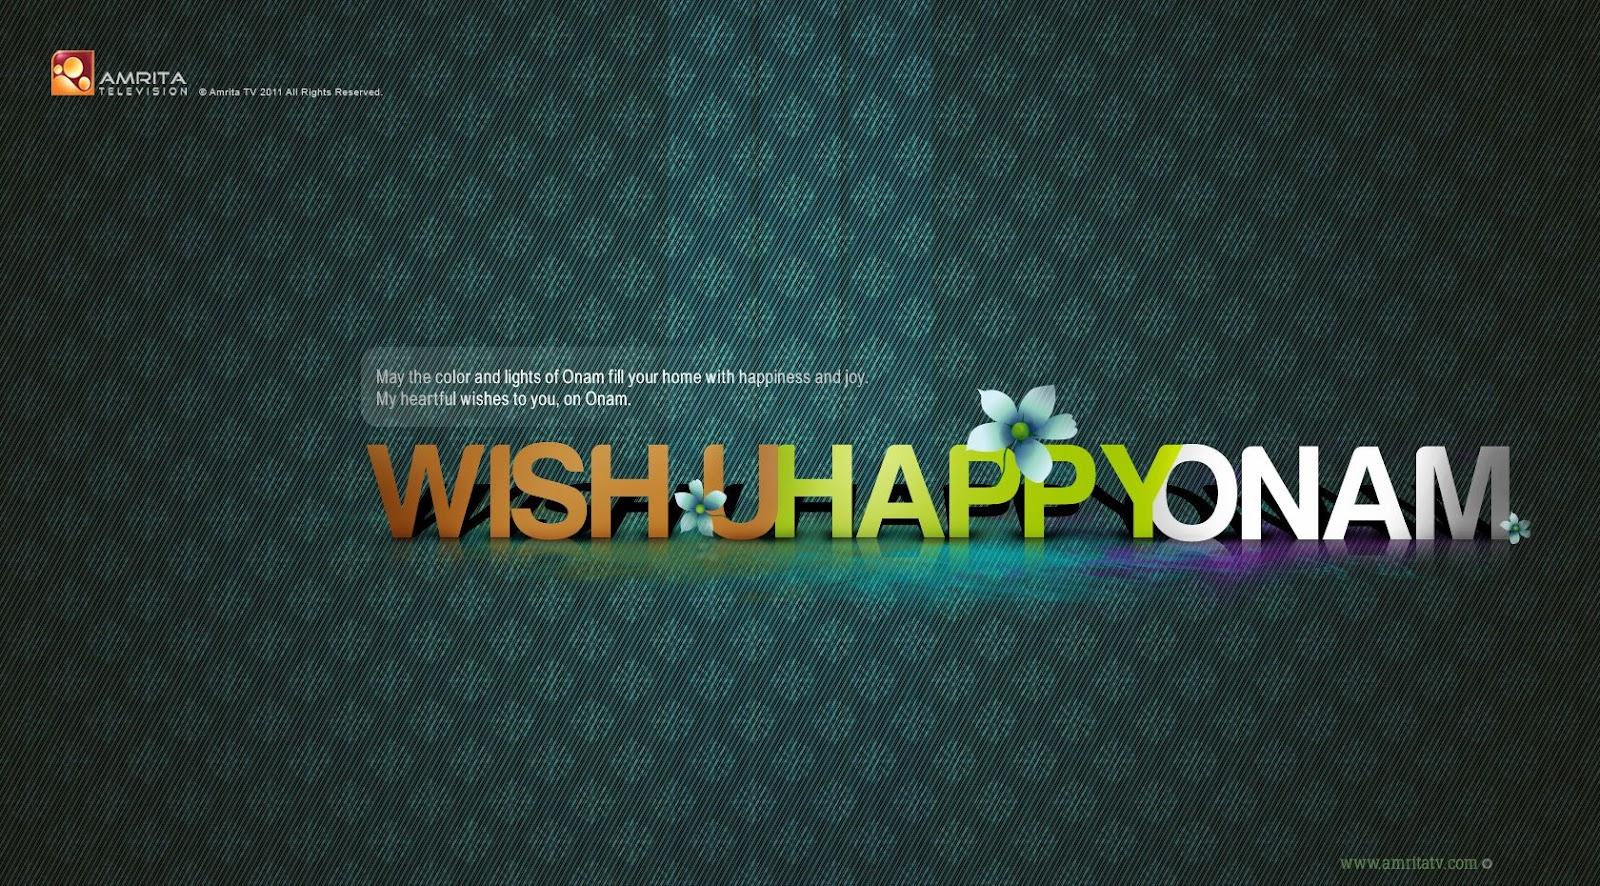 http://1.bp.blogspot.com/-L2yGk6PgkAM/UDNU0C98MYI/AAAAAAAADis/Fy6fazsiD1w/s1600/Happy-Onam-2012-wallpapers+%287%29.jpg